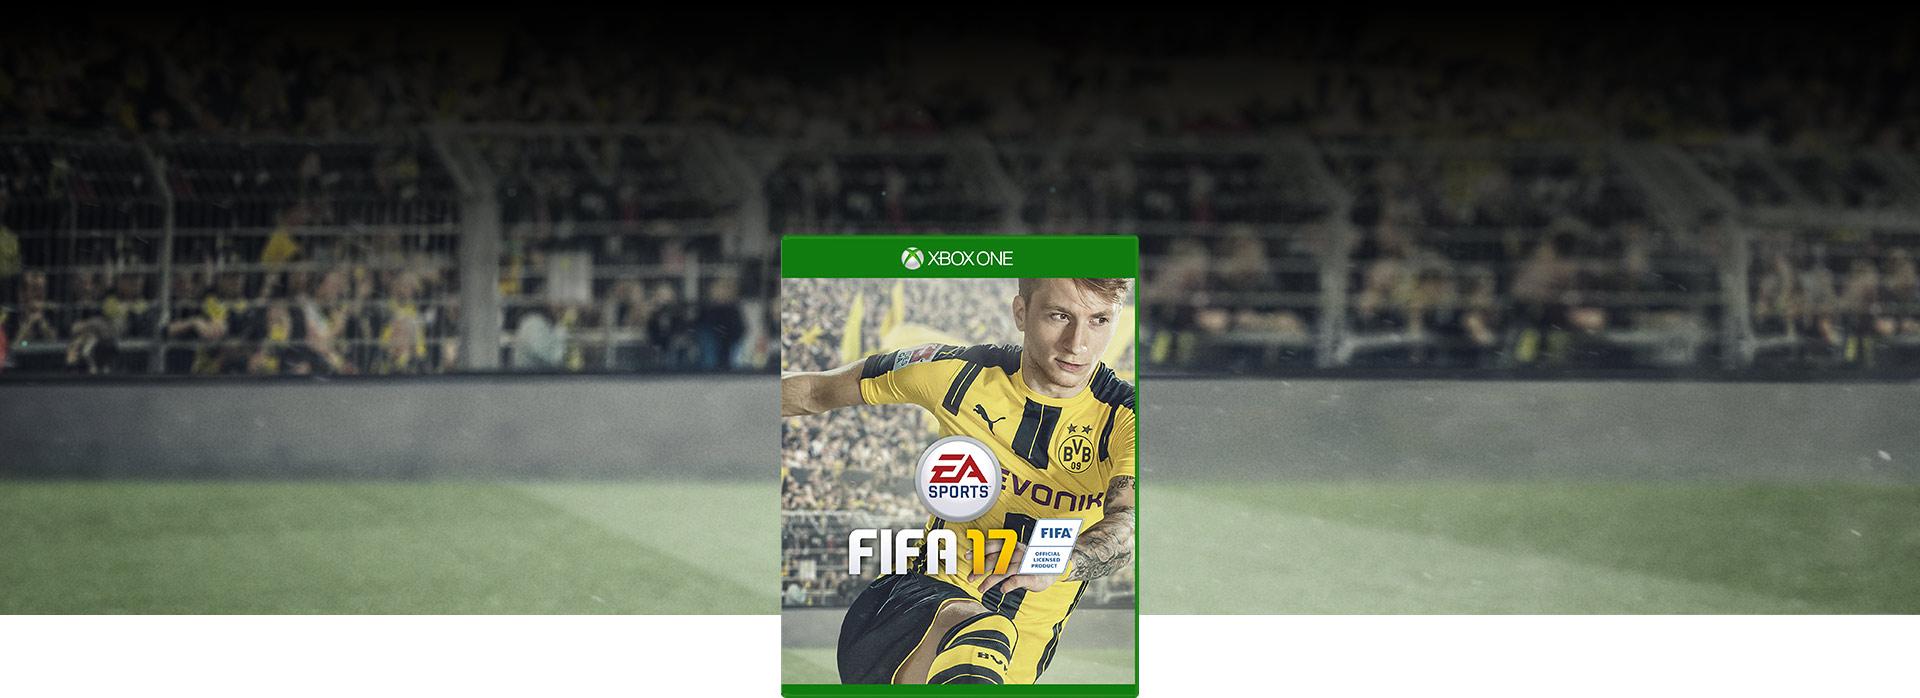 FIFA17 Boxshot